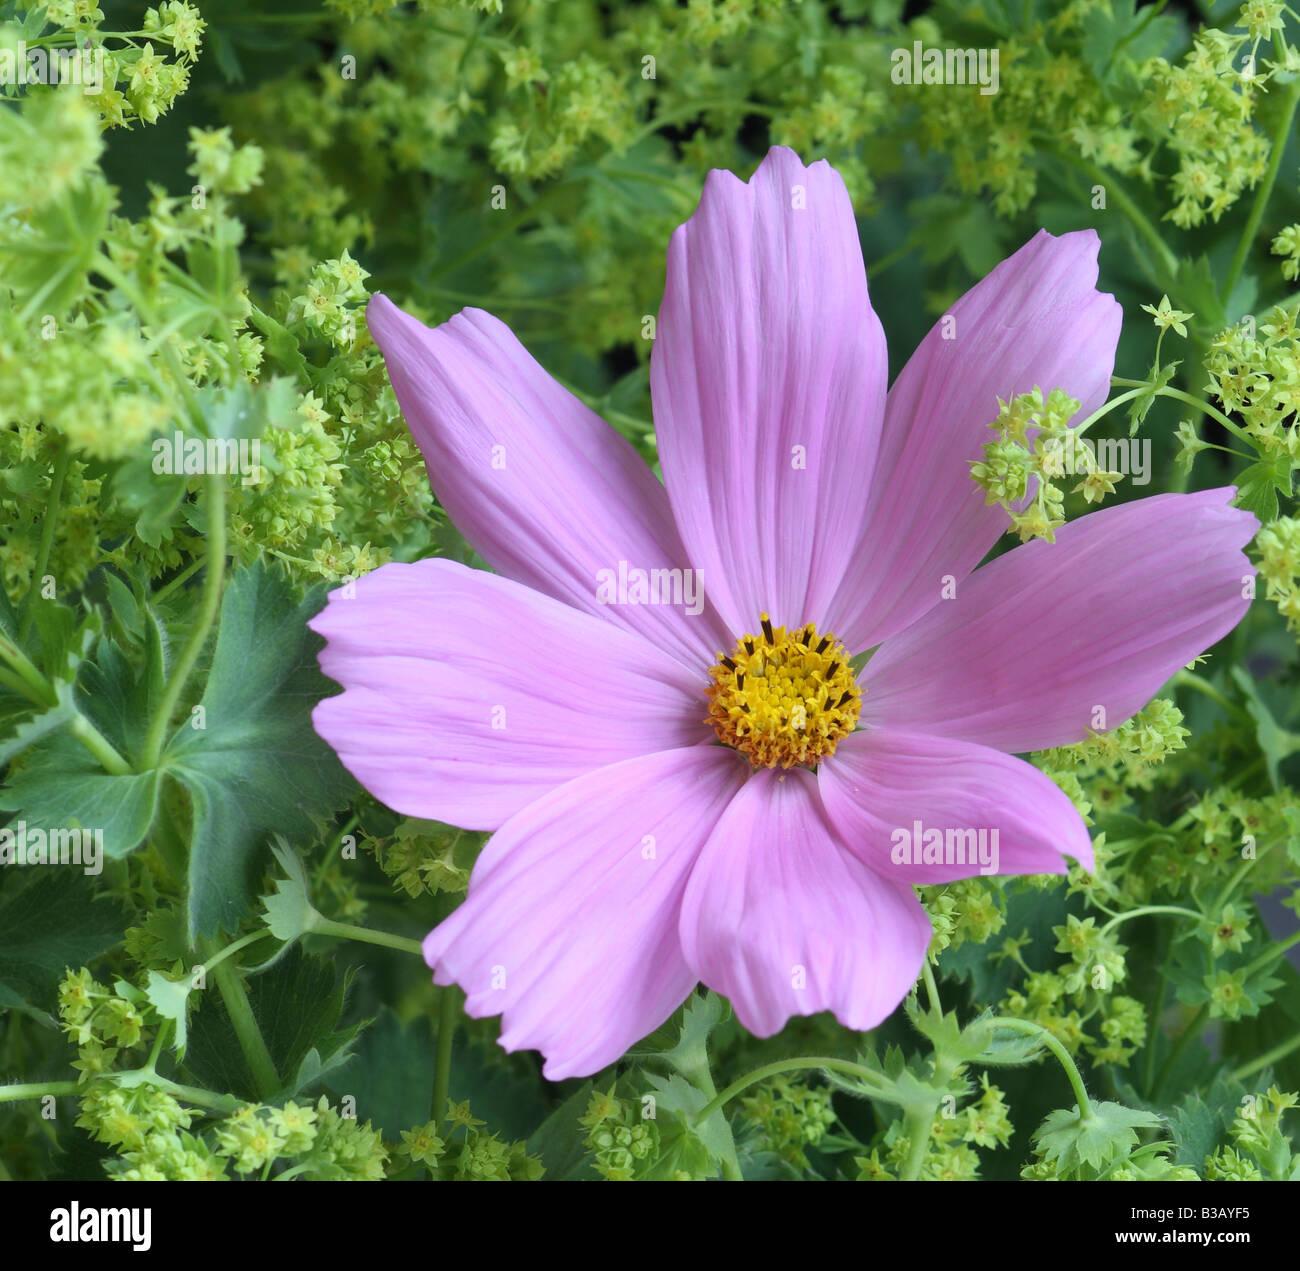 Rosa Cosmos und Damen Mantel, Alchemilla mollis Stockbild